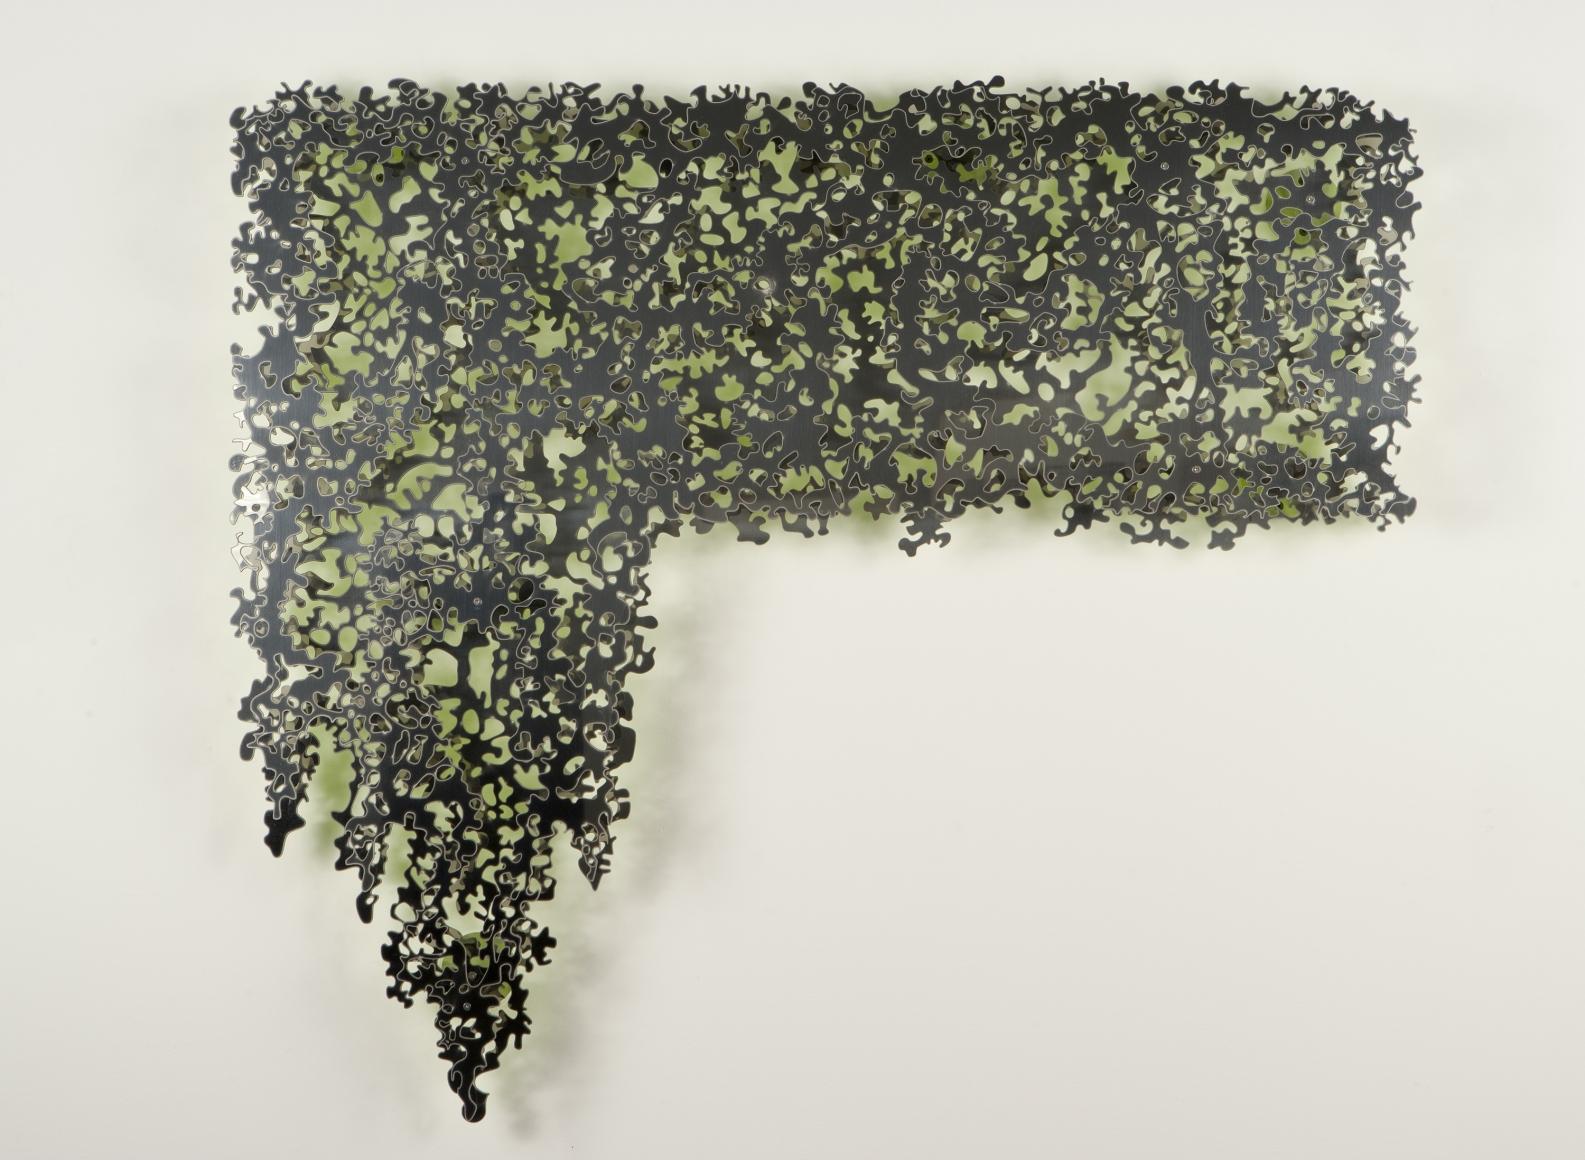 TERESITA FERNÁNDEZ, Mirror (Trellis), 2010